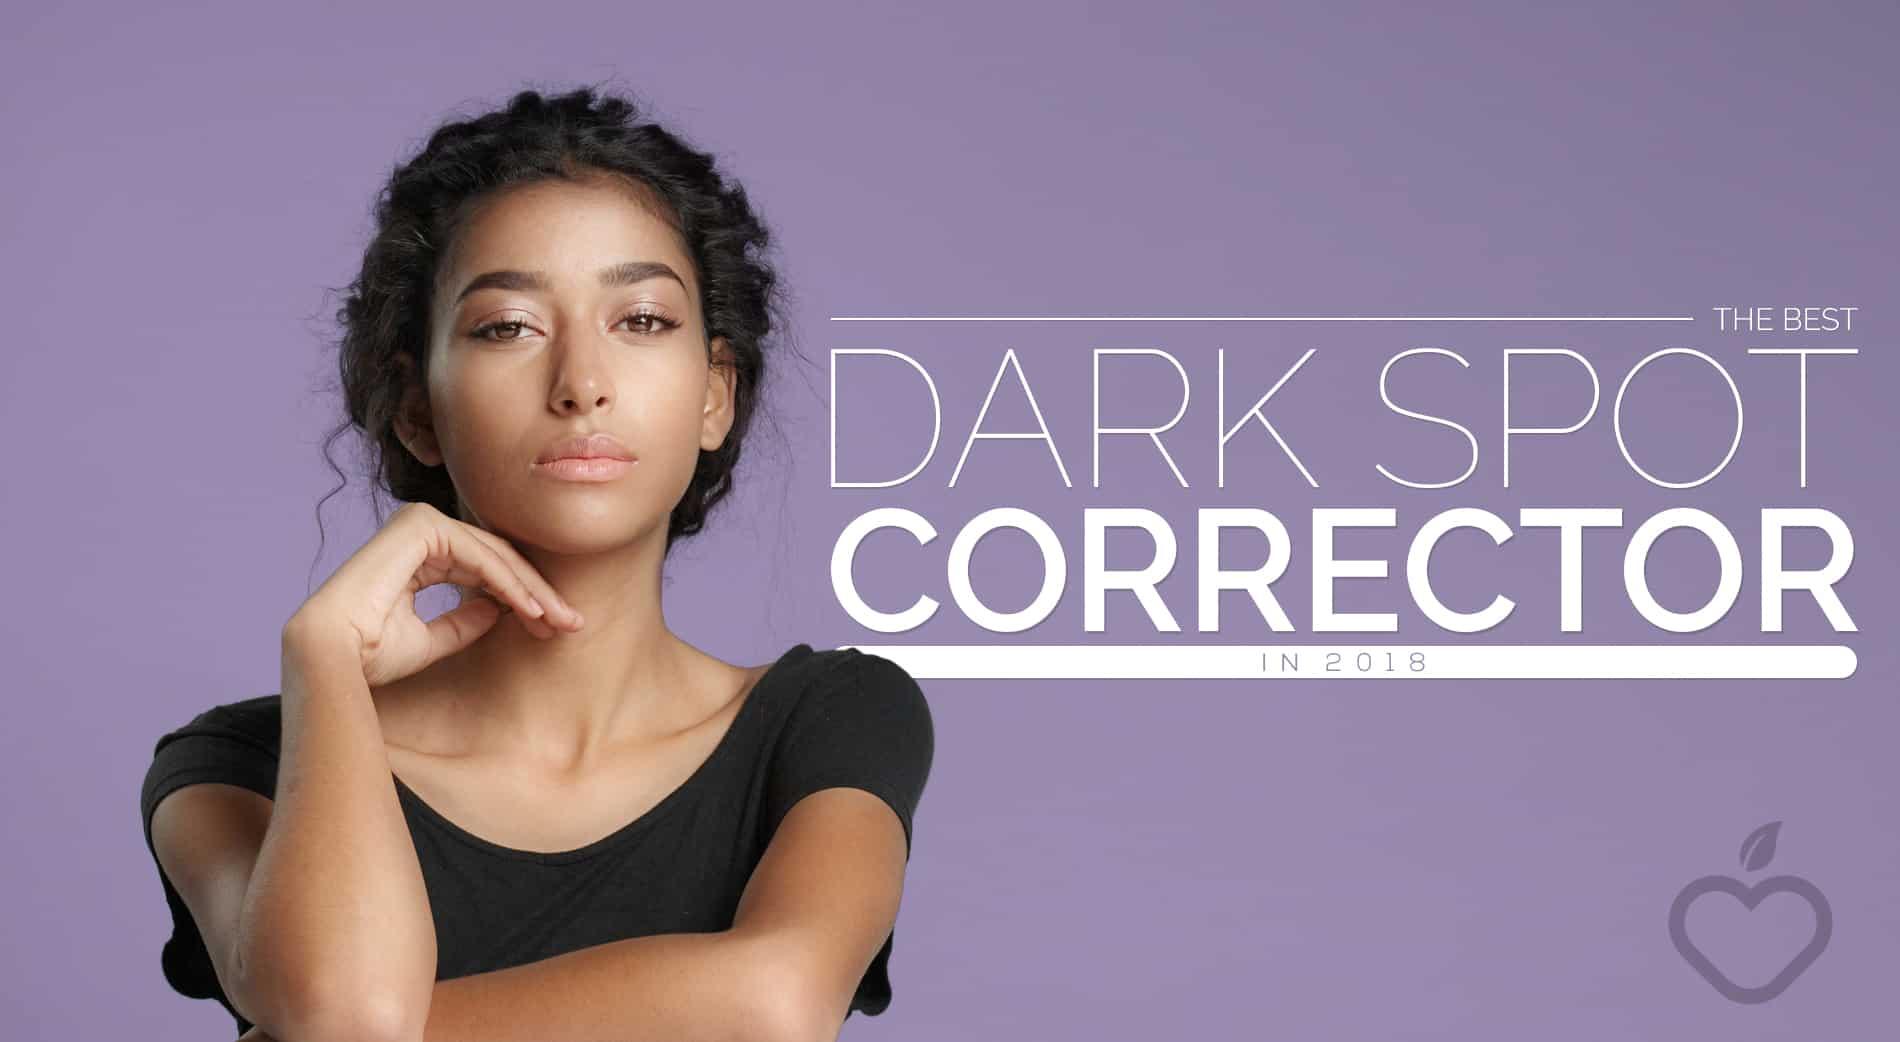 Dark Spot Corrector Image Design 1 - The Greatest Darkish Spot Corrector in 2018